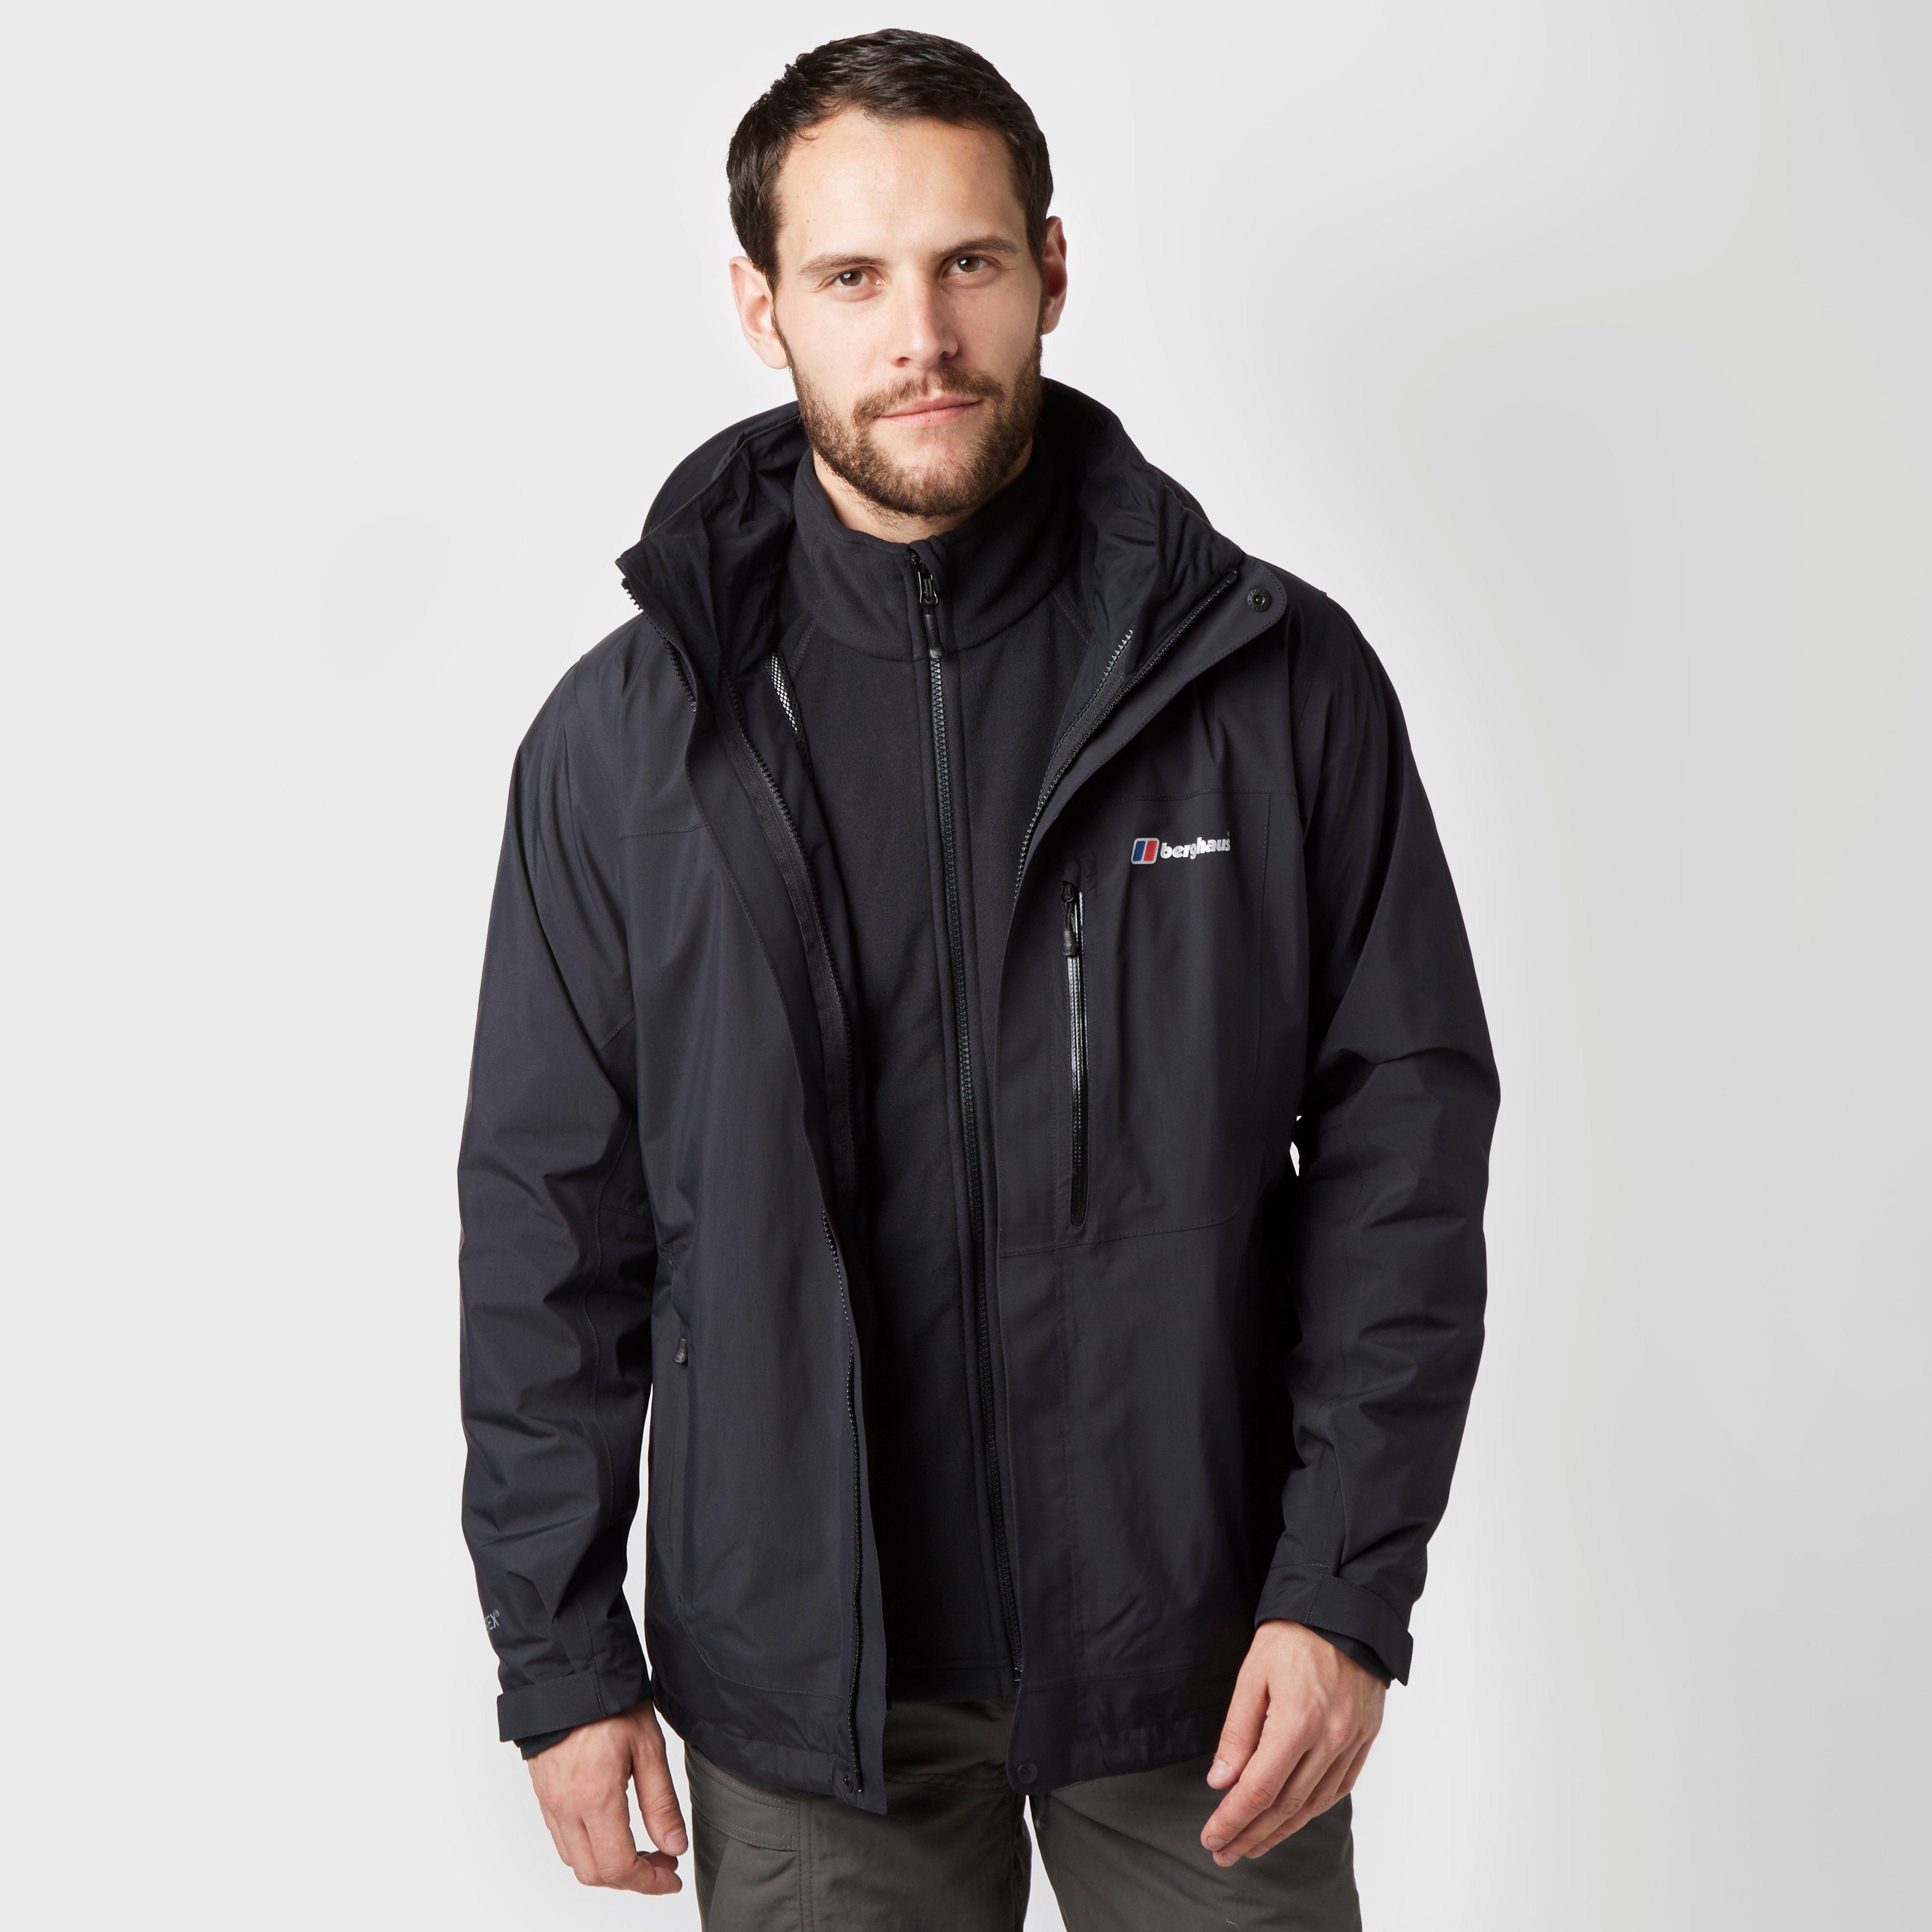 BERGHAUS Men's Arisdale 3 in 1 GORE-TEX® Jacket